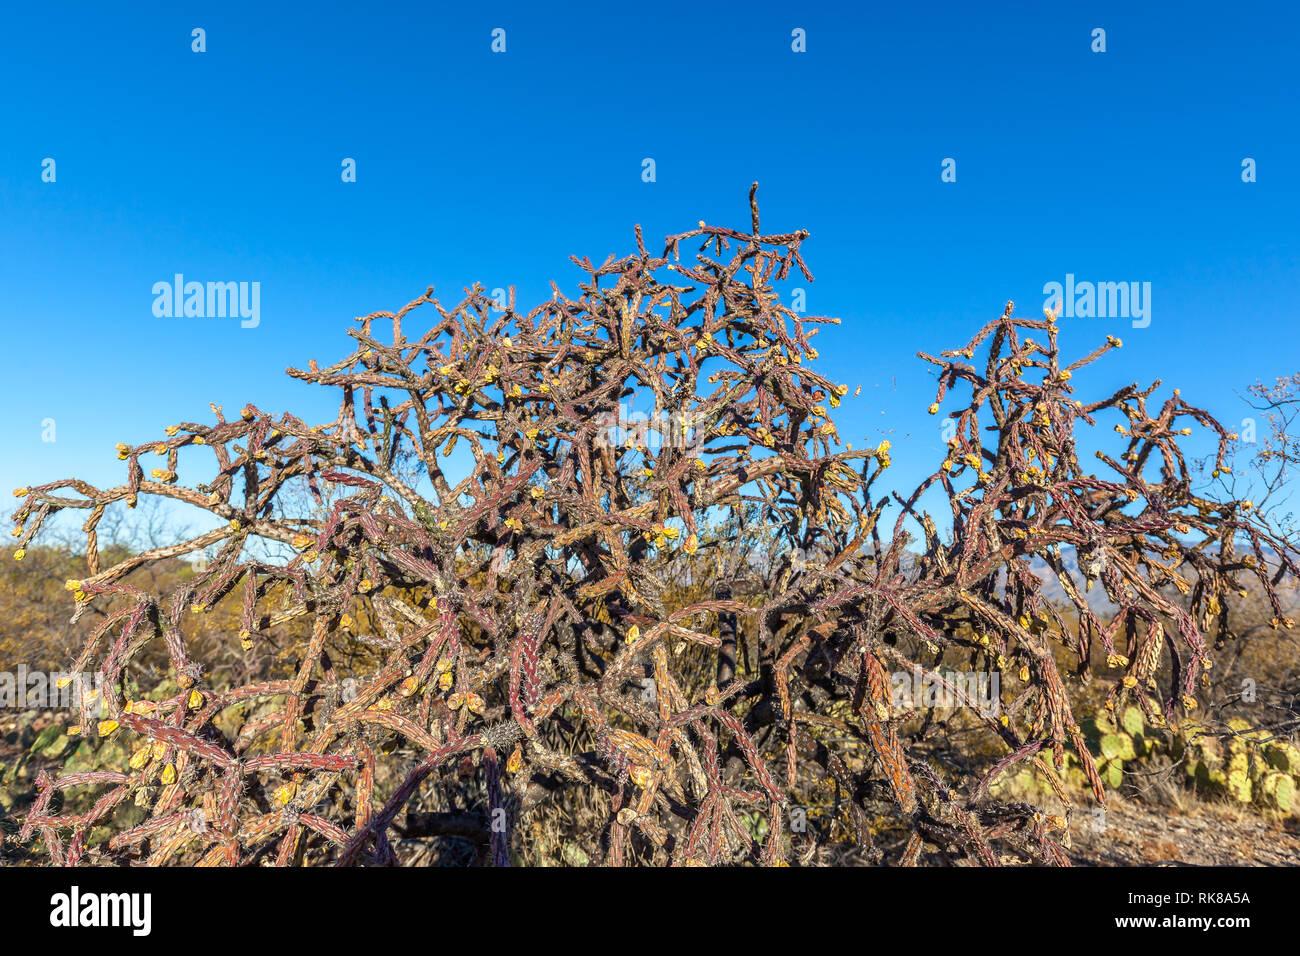 Close up of the buckhorn cholla (Cylindropuntia acanthocarpa) in Saguaro National Park in Tucson, Arizona. Stock Photo